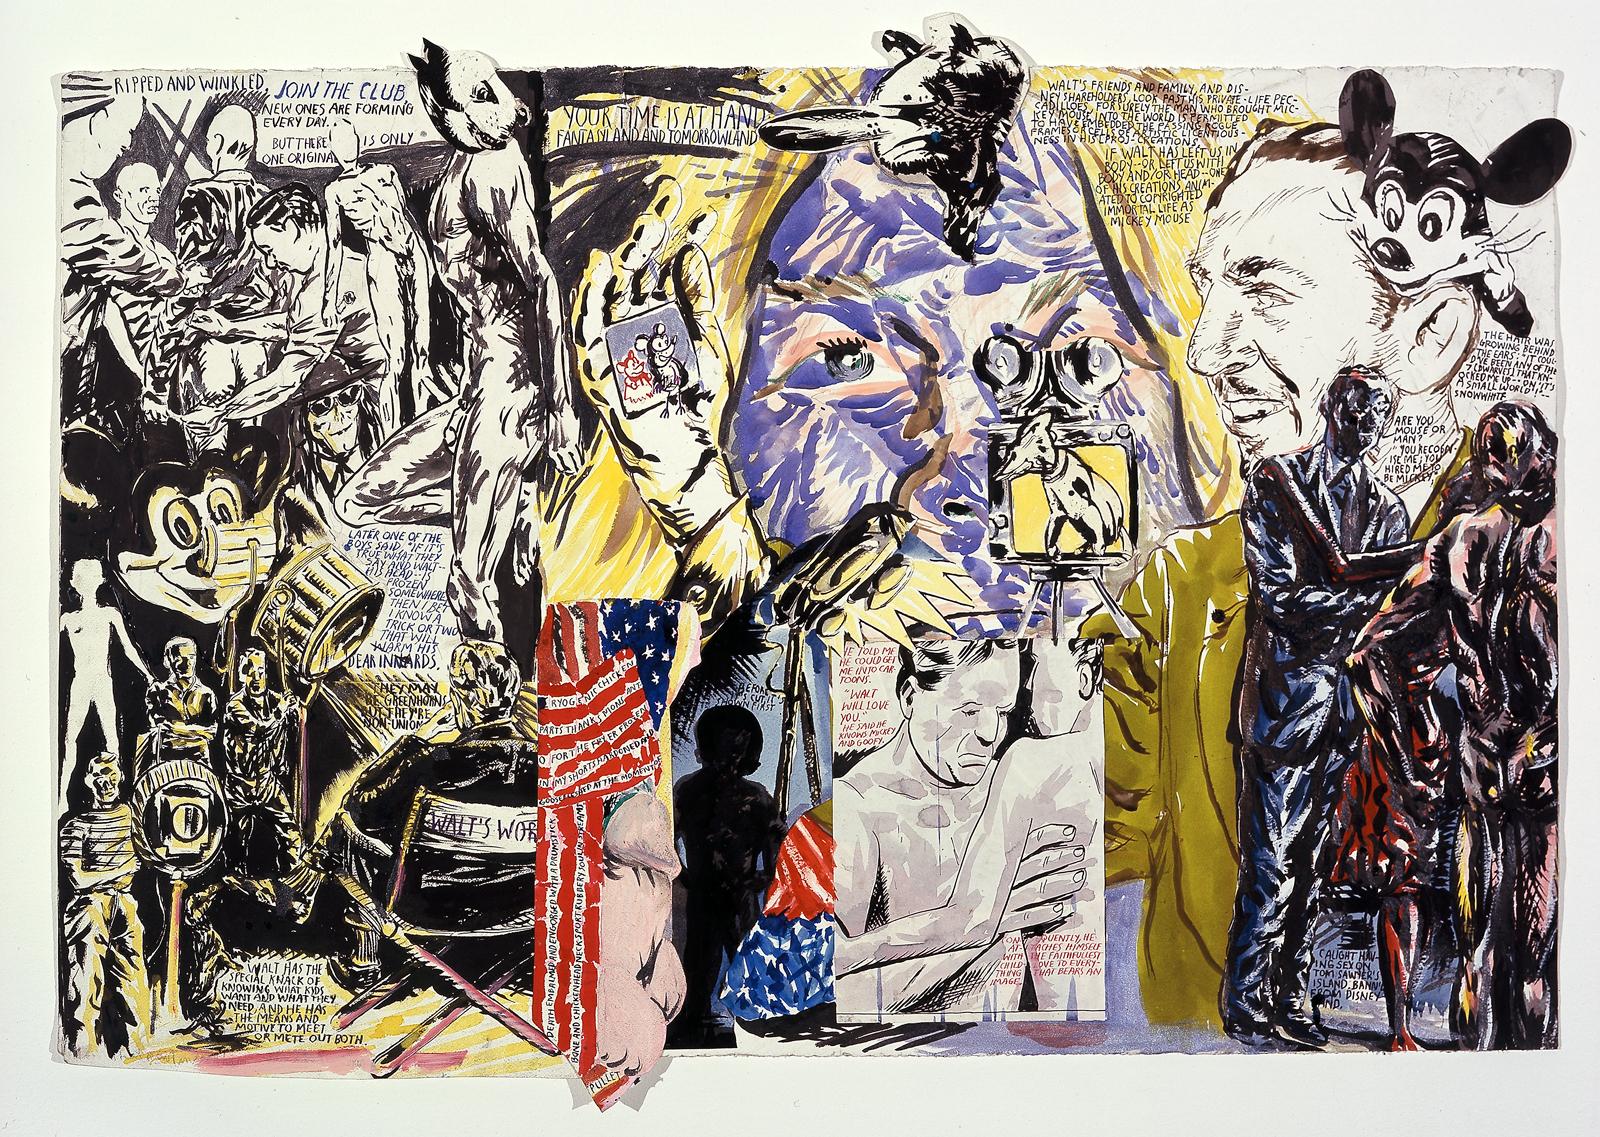 Raymond Pettibon: No Title (Ripped and wrinkled), 2008